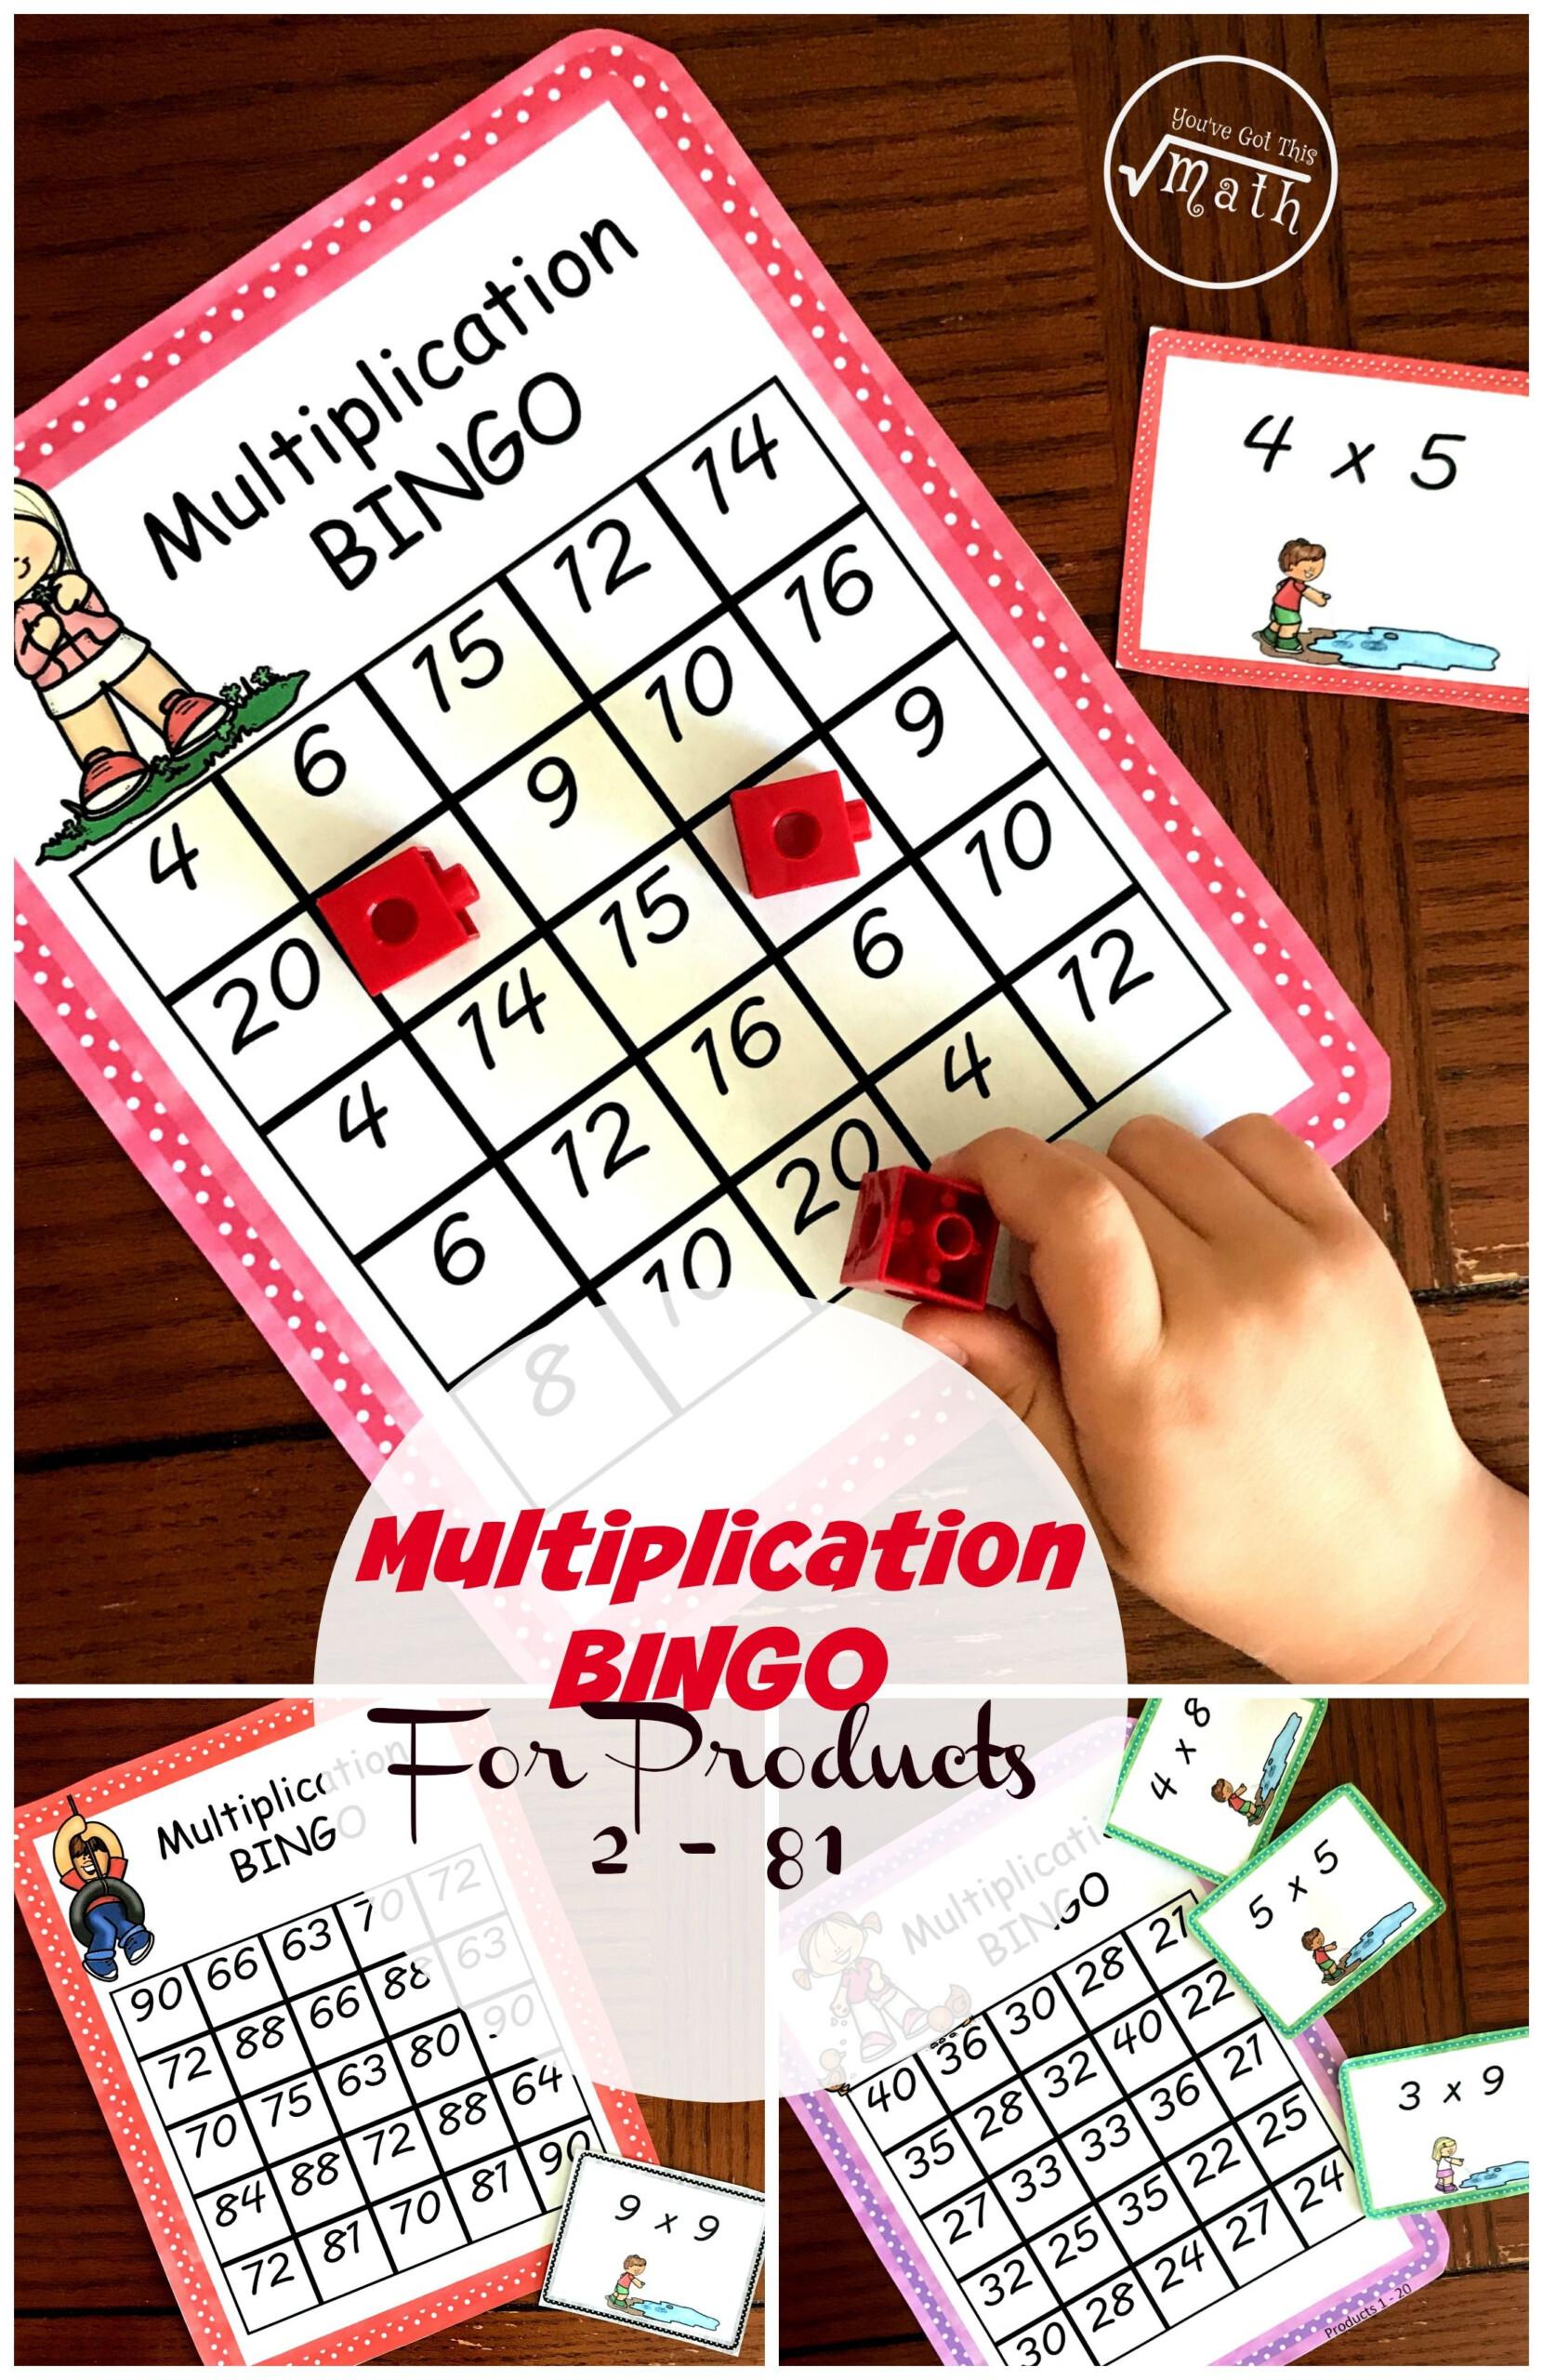 Multiplication Bingo - A Fun Game To Practice Multiplication